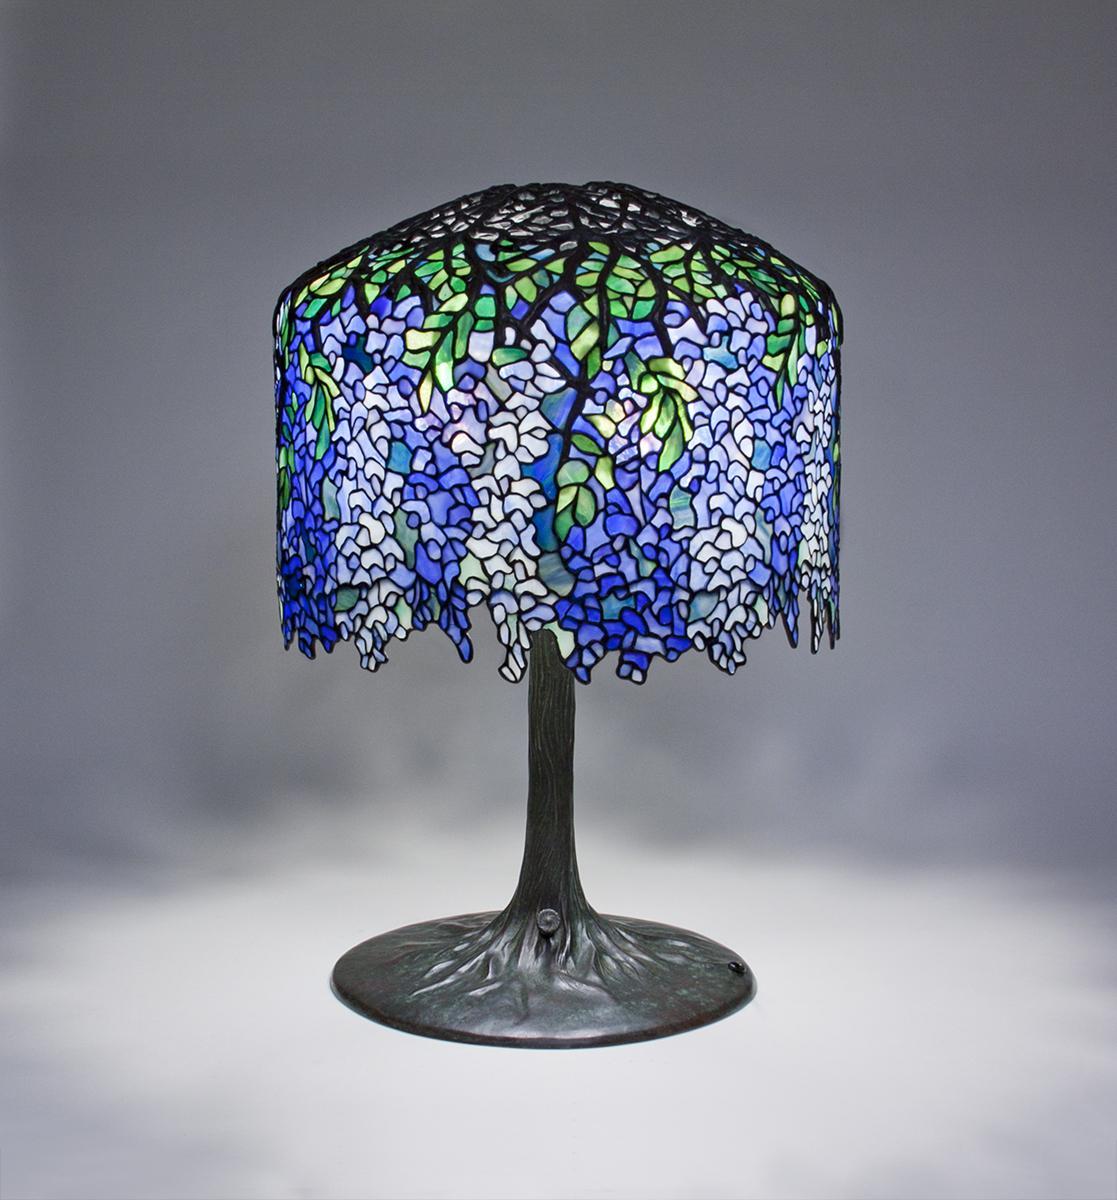 Tiffany Studios Wisteria Table Lamp Tiffany Studios Lamps Catalogue Lillian Nassau Llc